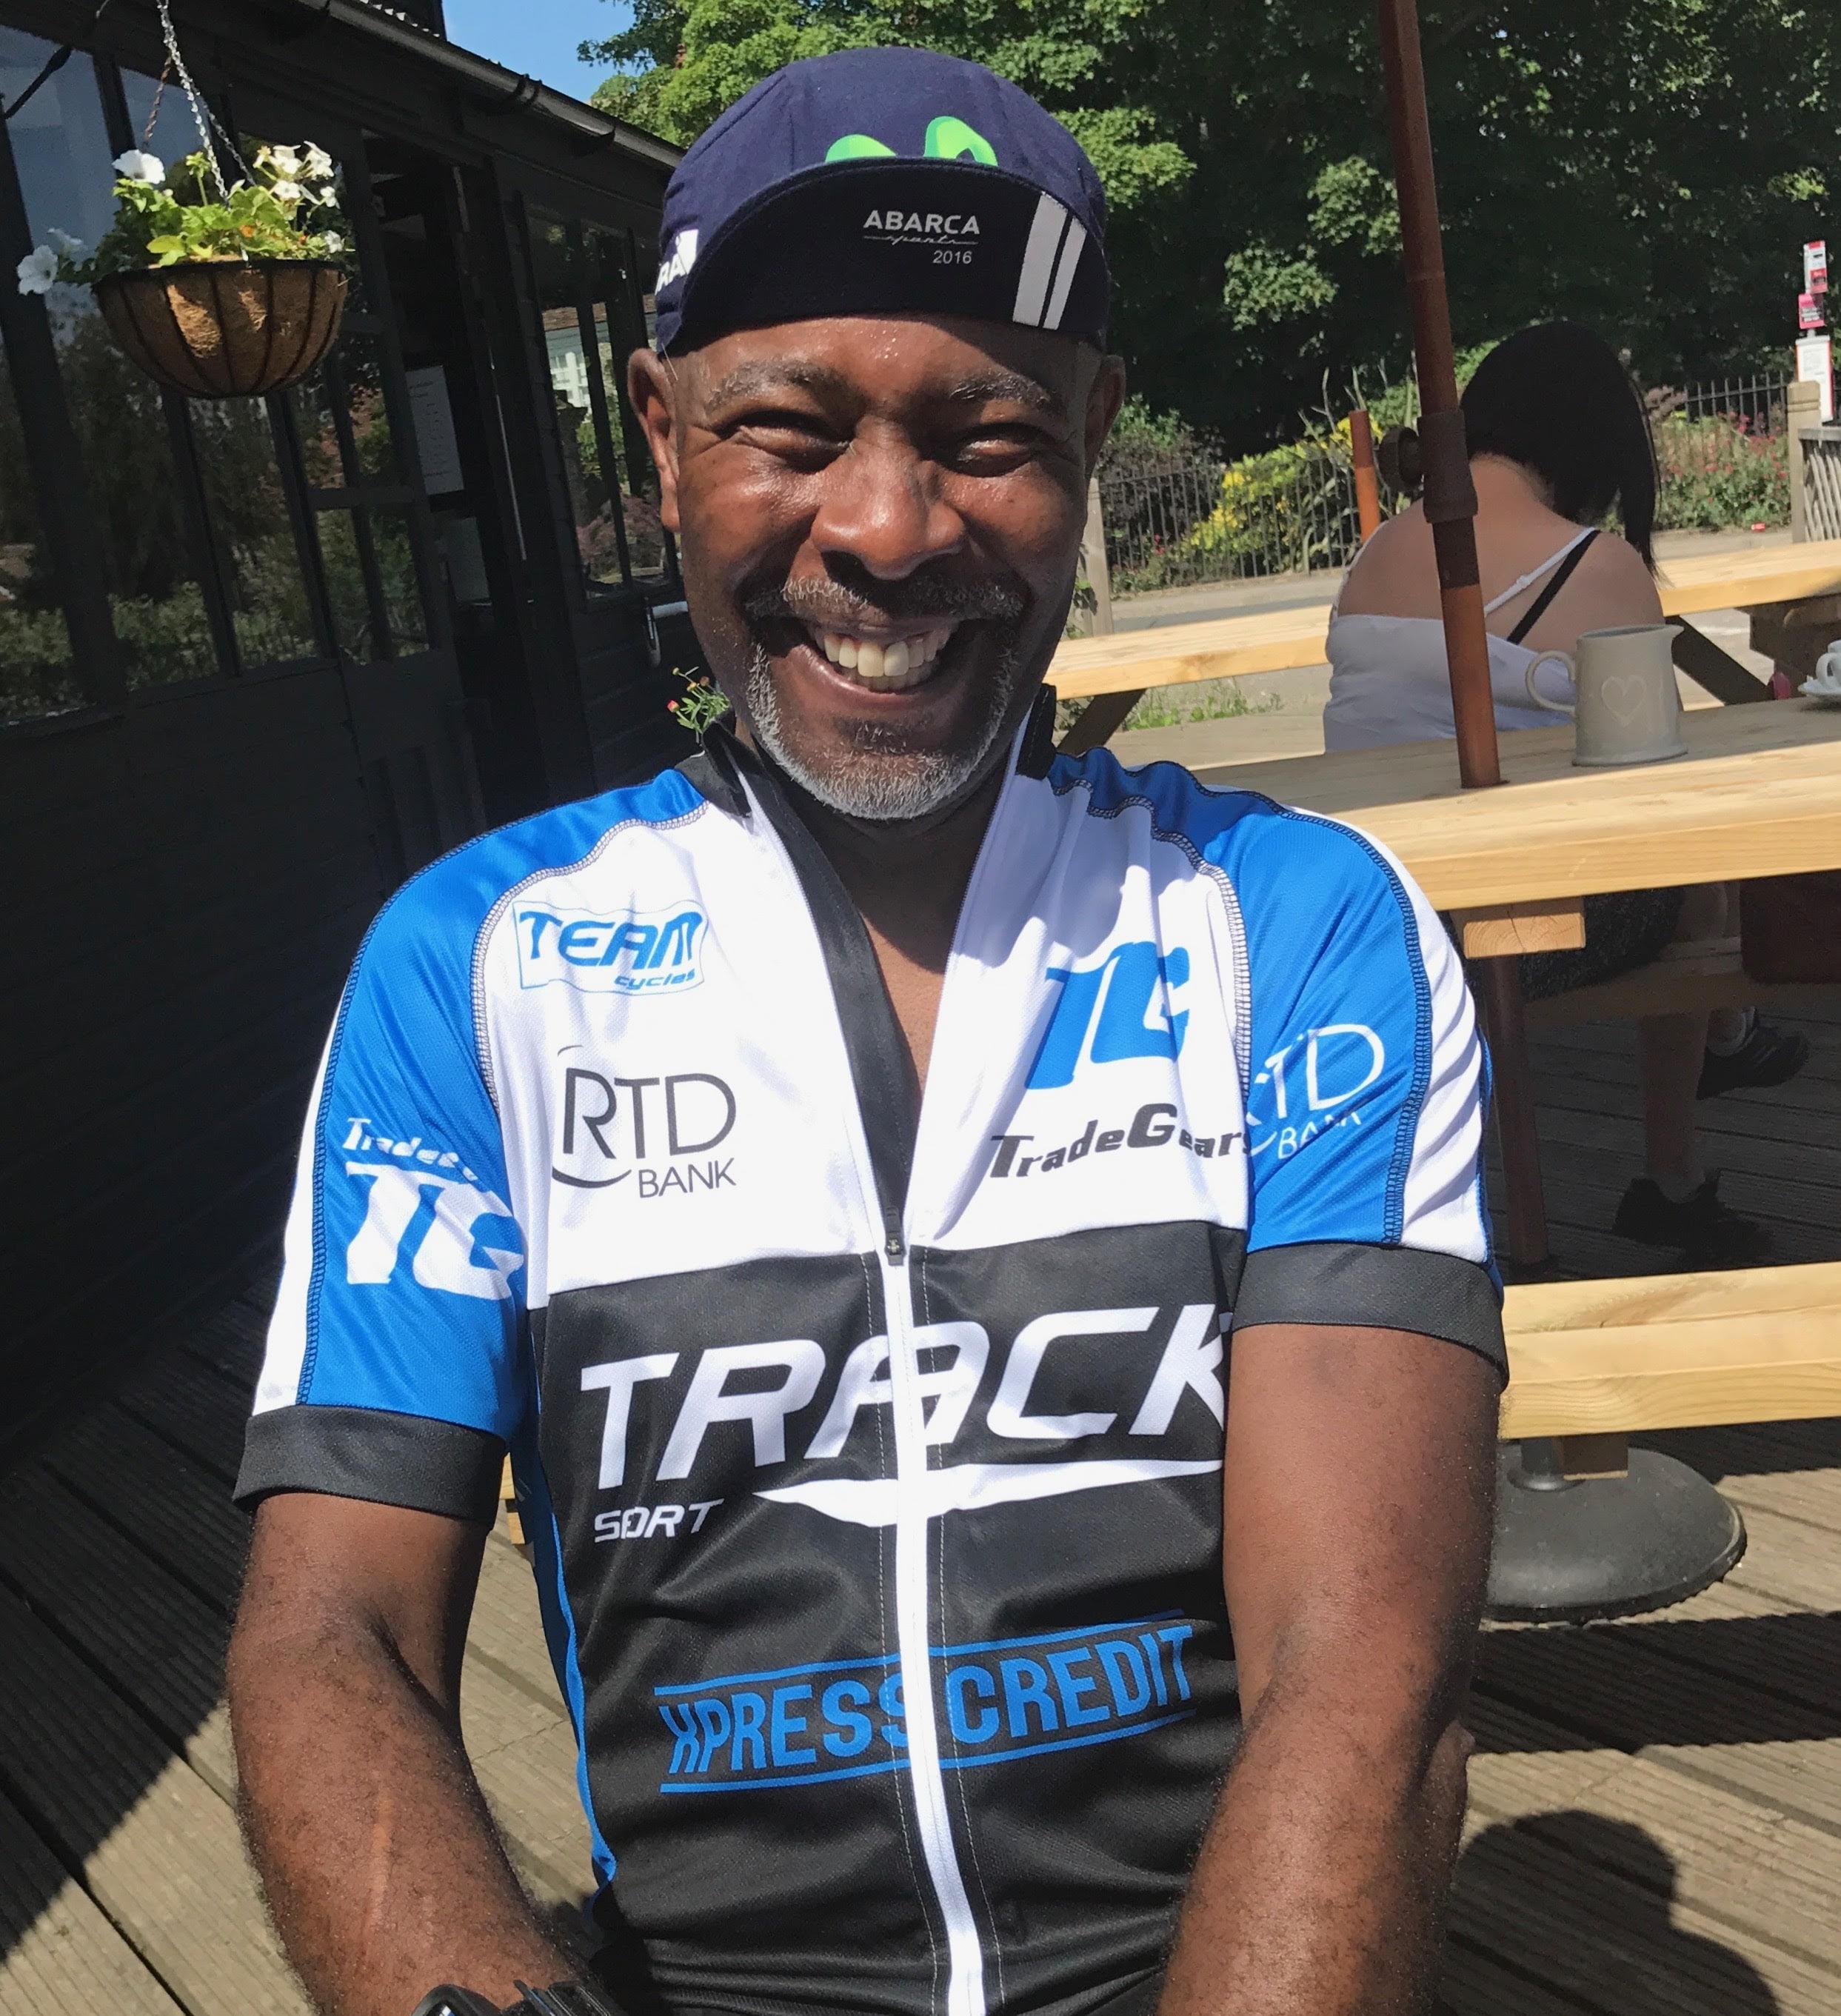 From Novice to Triathlete